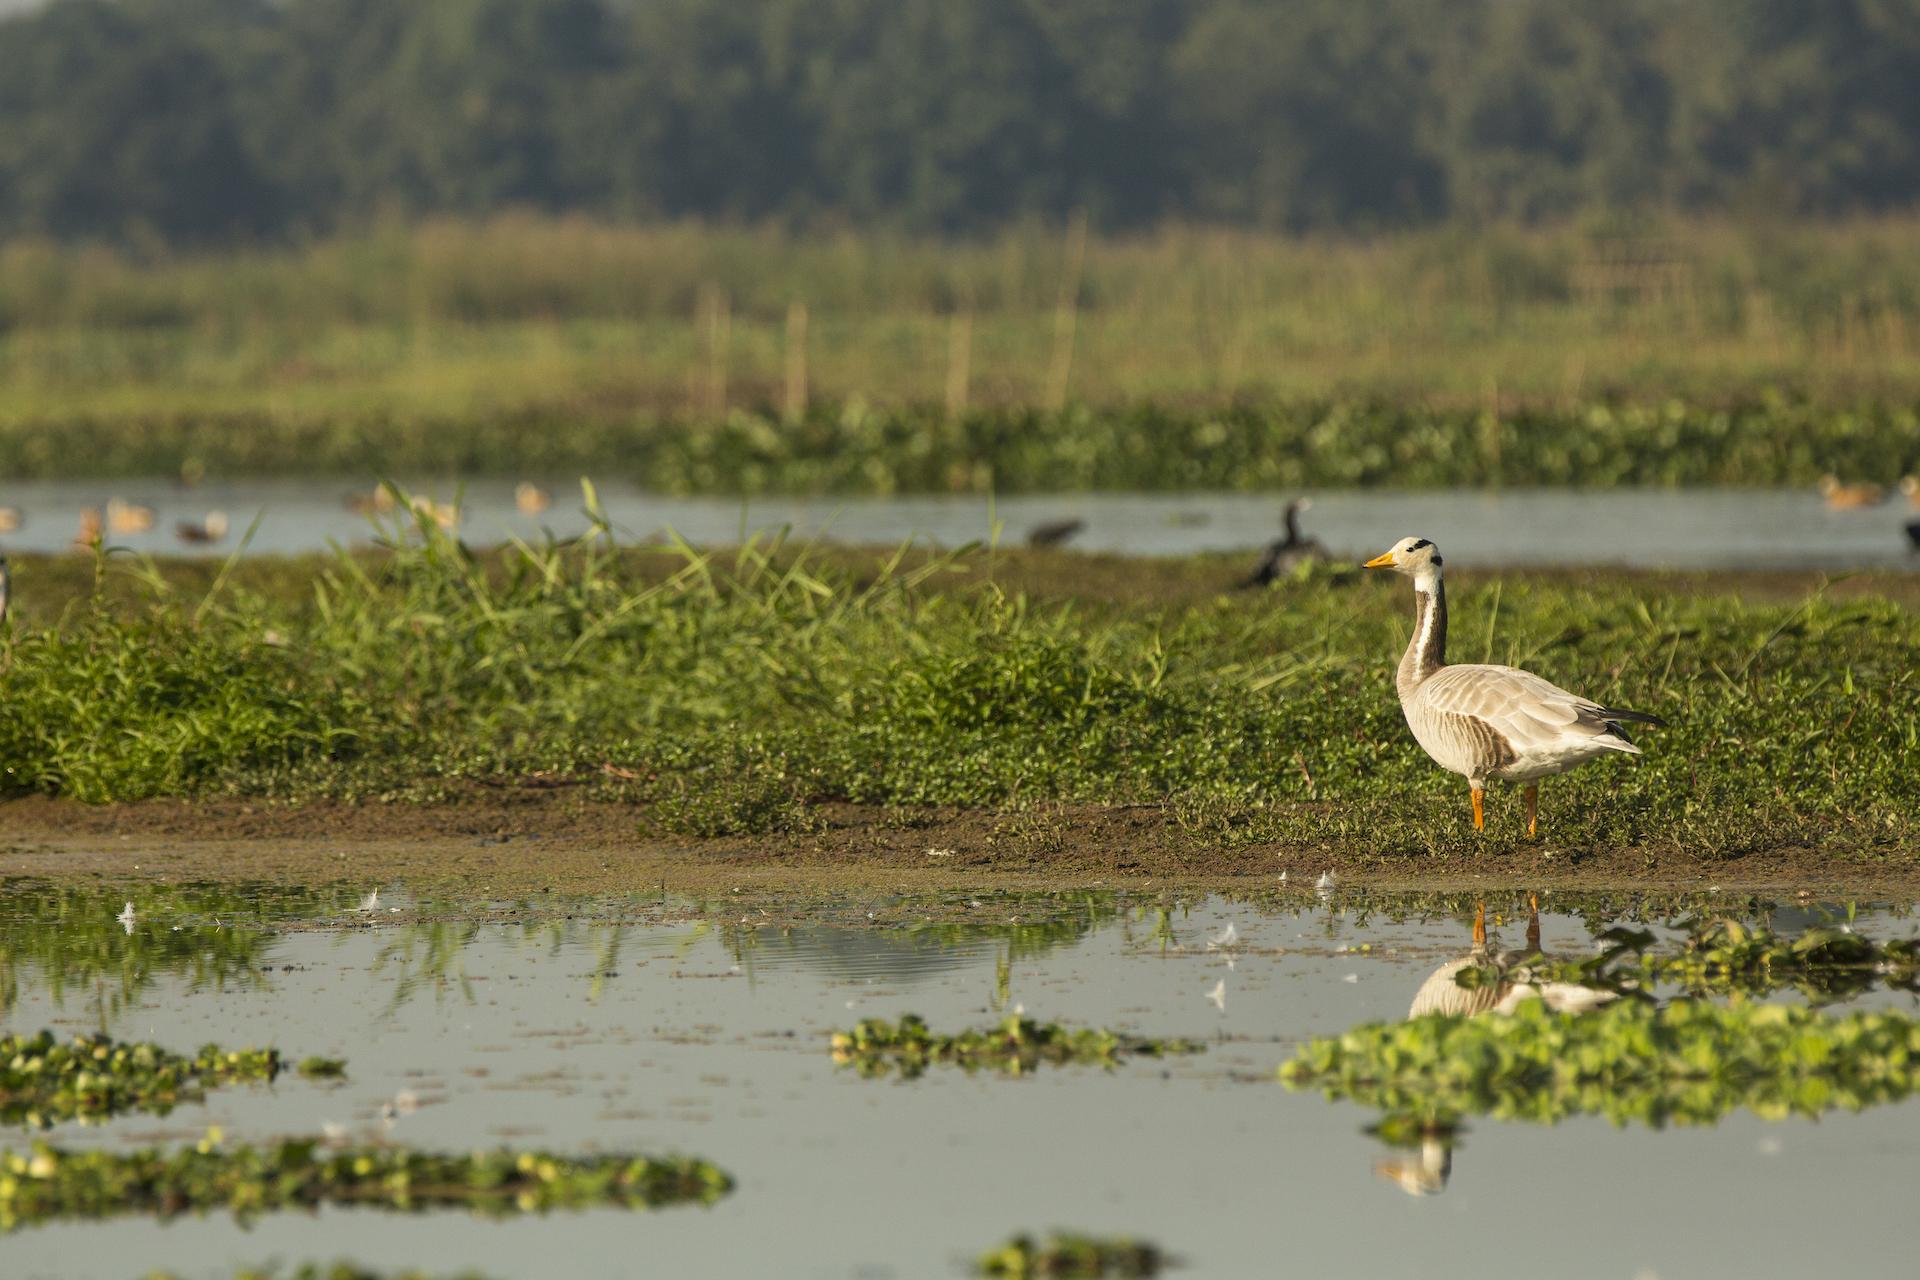 A bar-headed goose in Assam's Dibru Saikhowa National Park. Photo: Mayank Soni